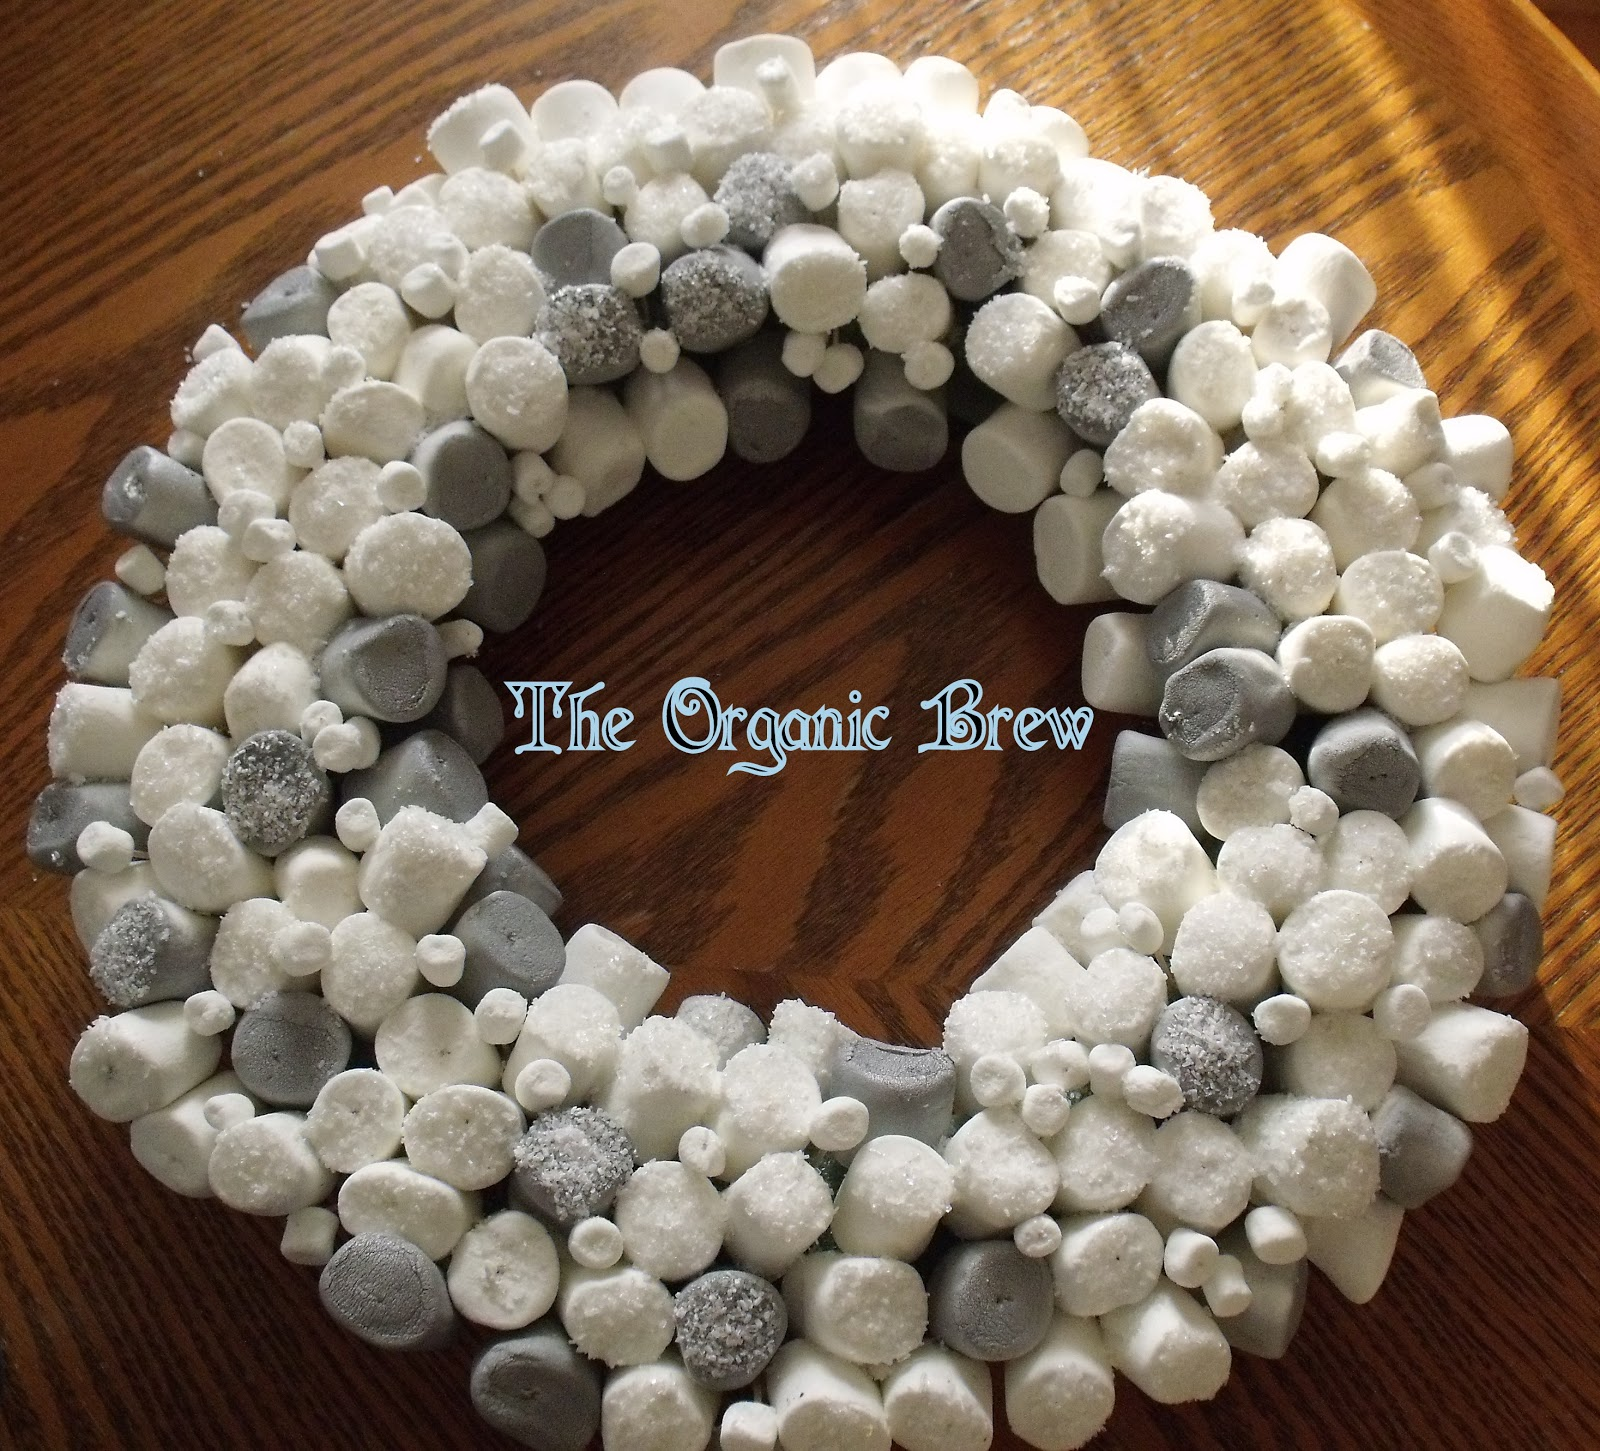 The Organic Brew Diy Marshmallow Wreath